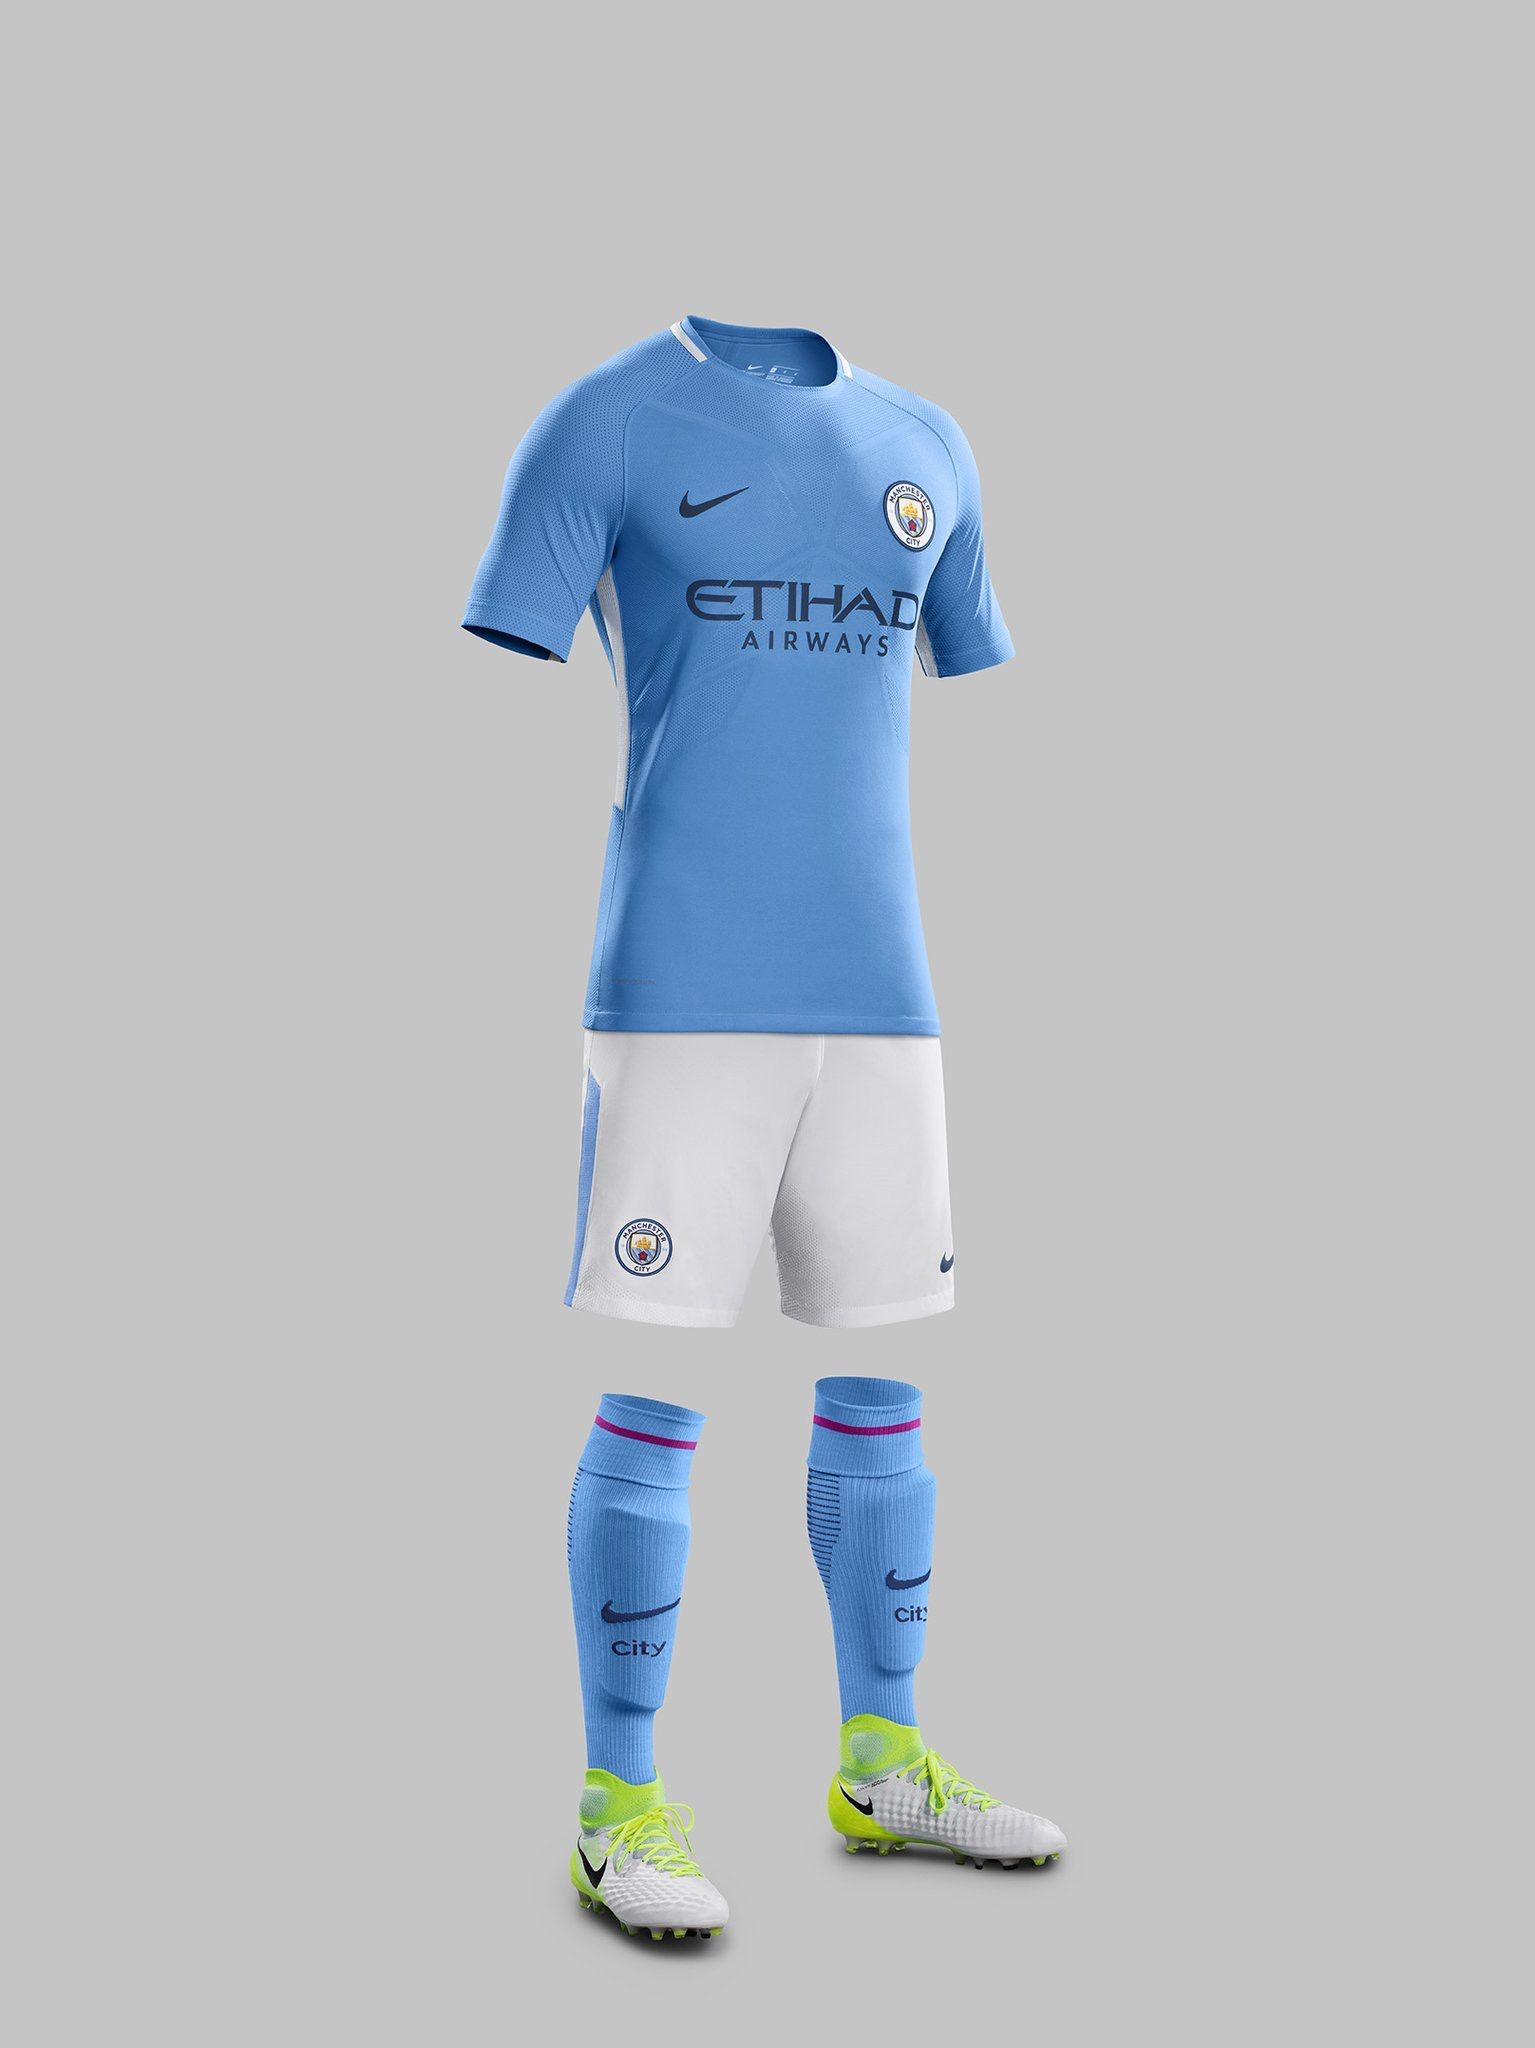 Manchester City Psg 2019